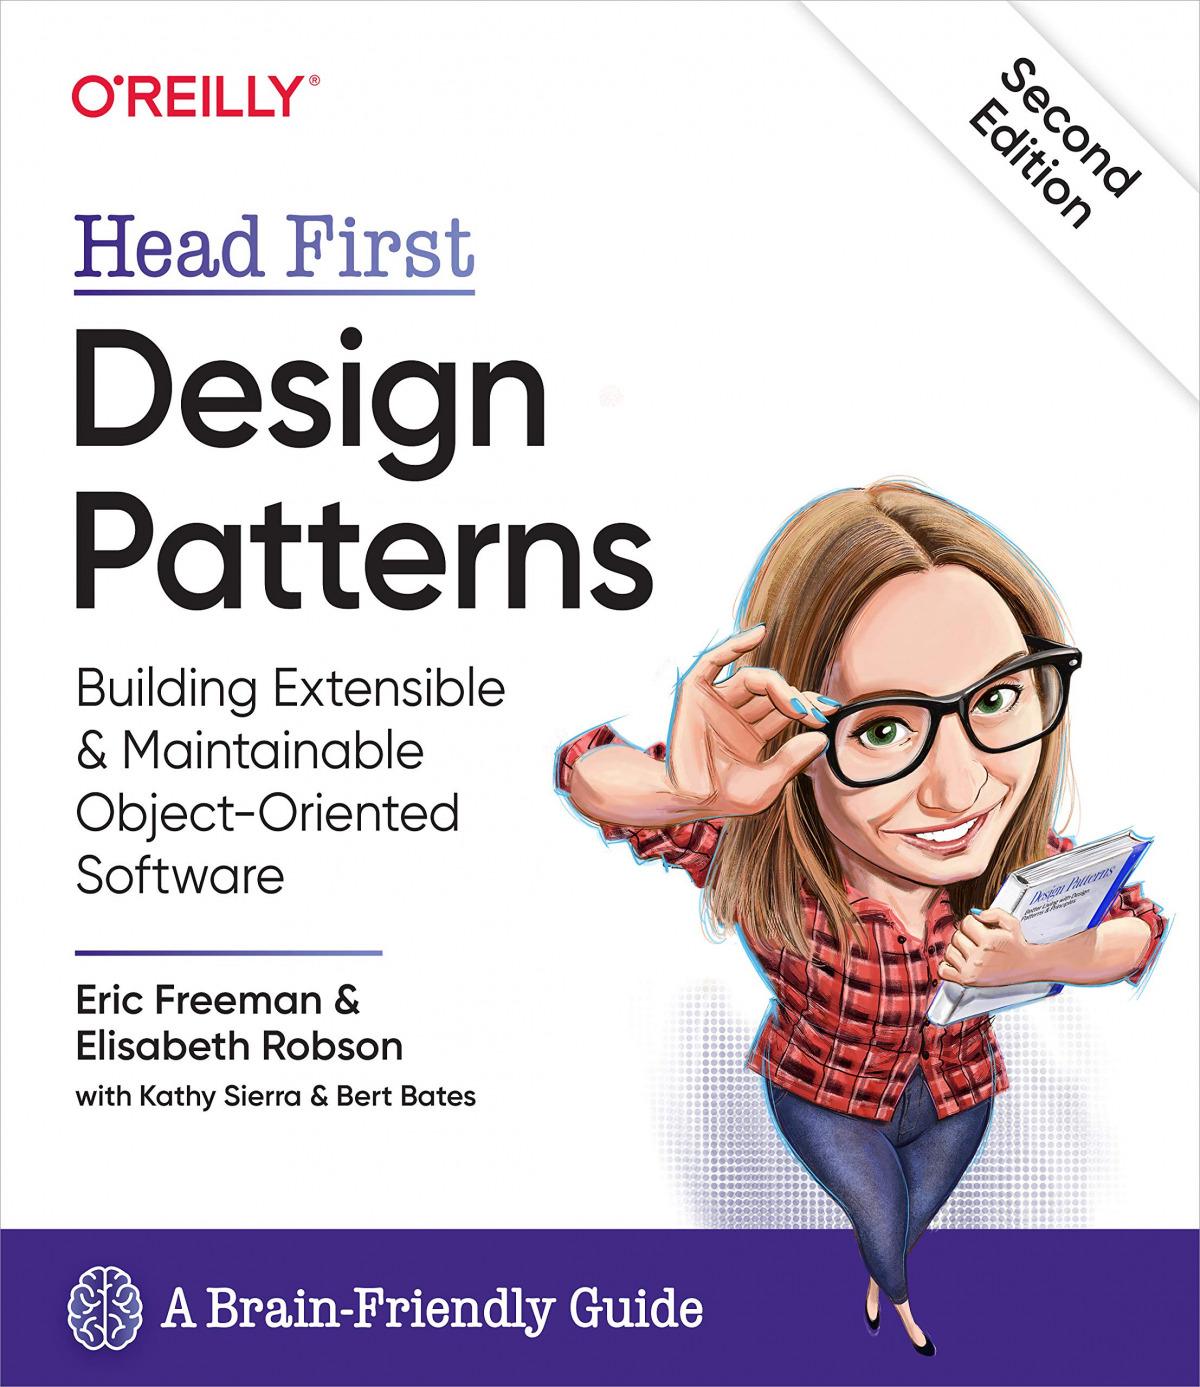 Heard first design patterns